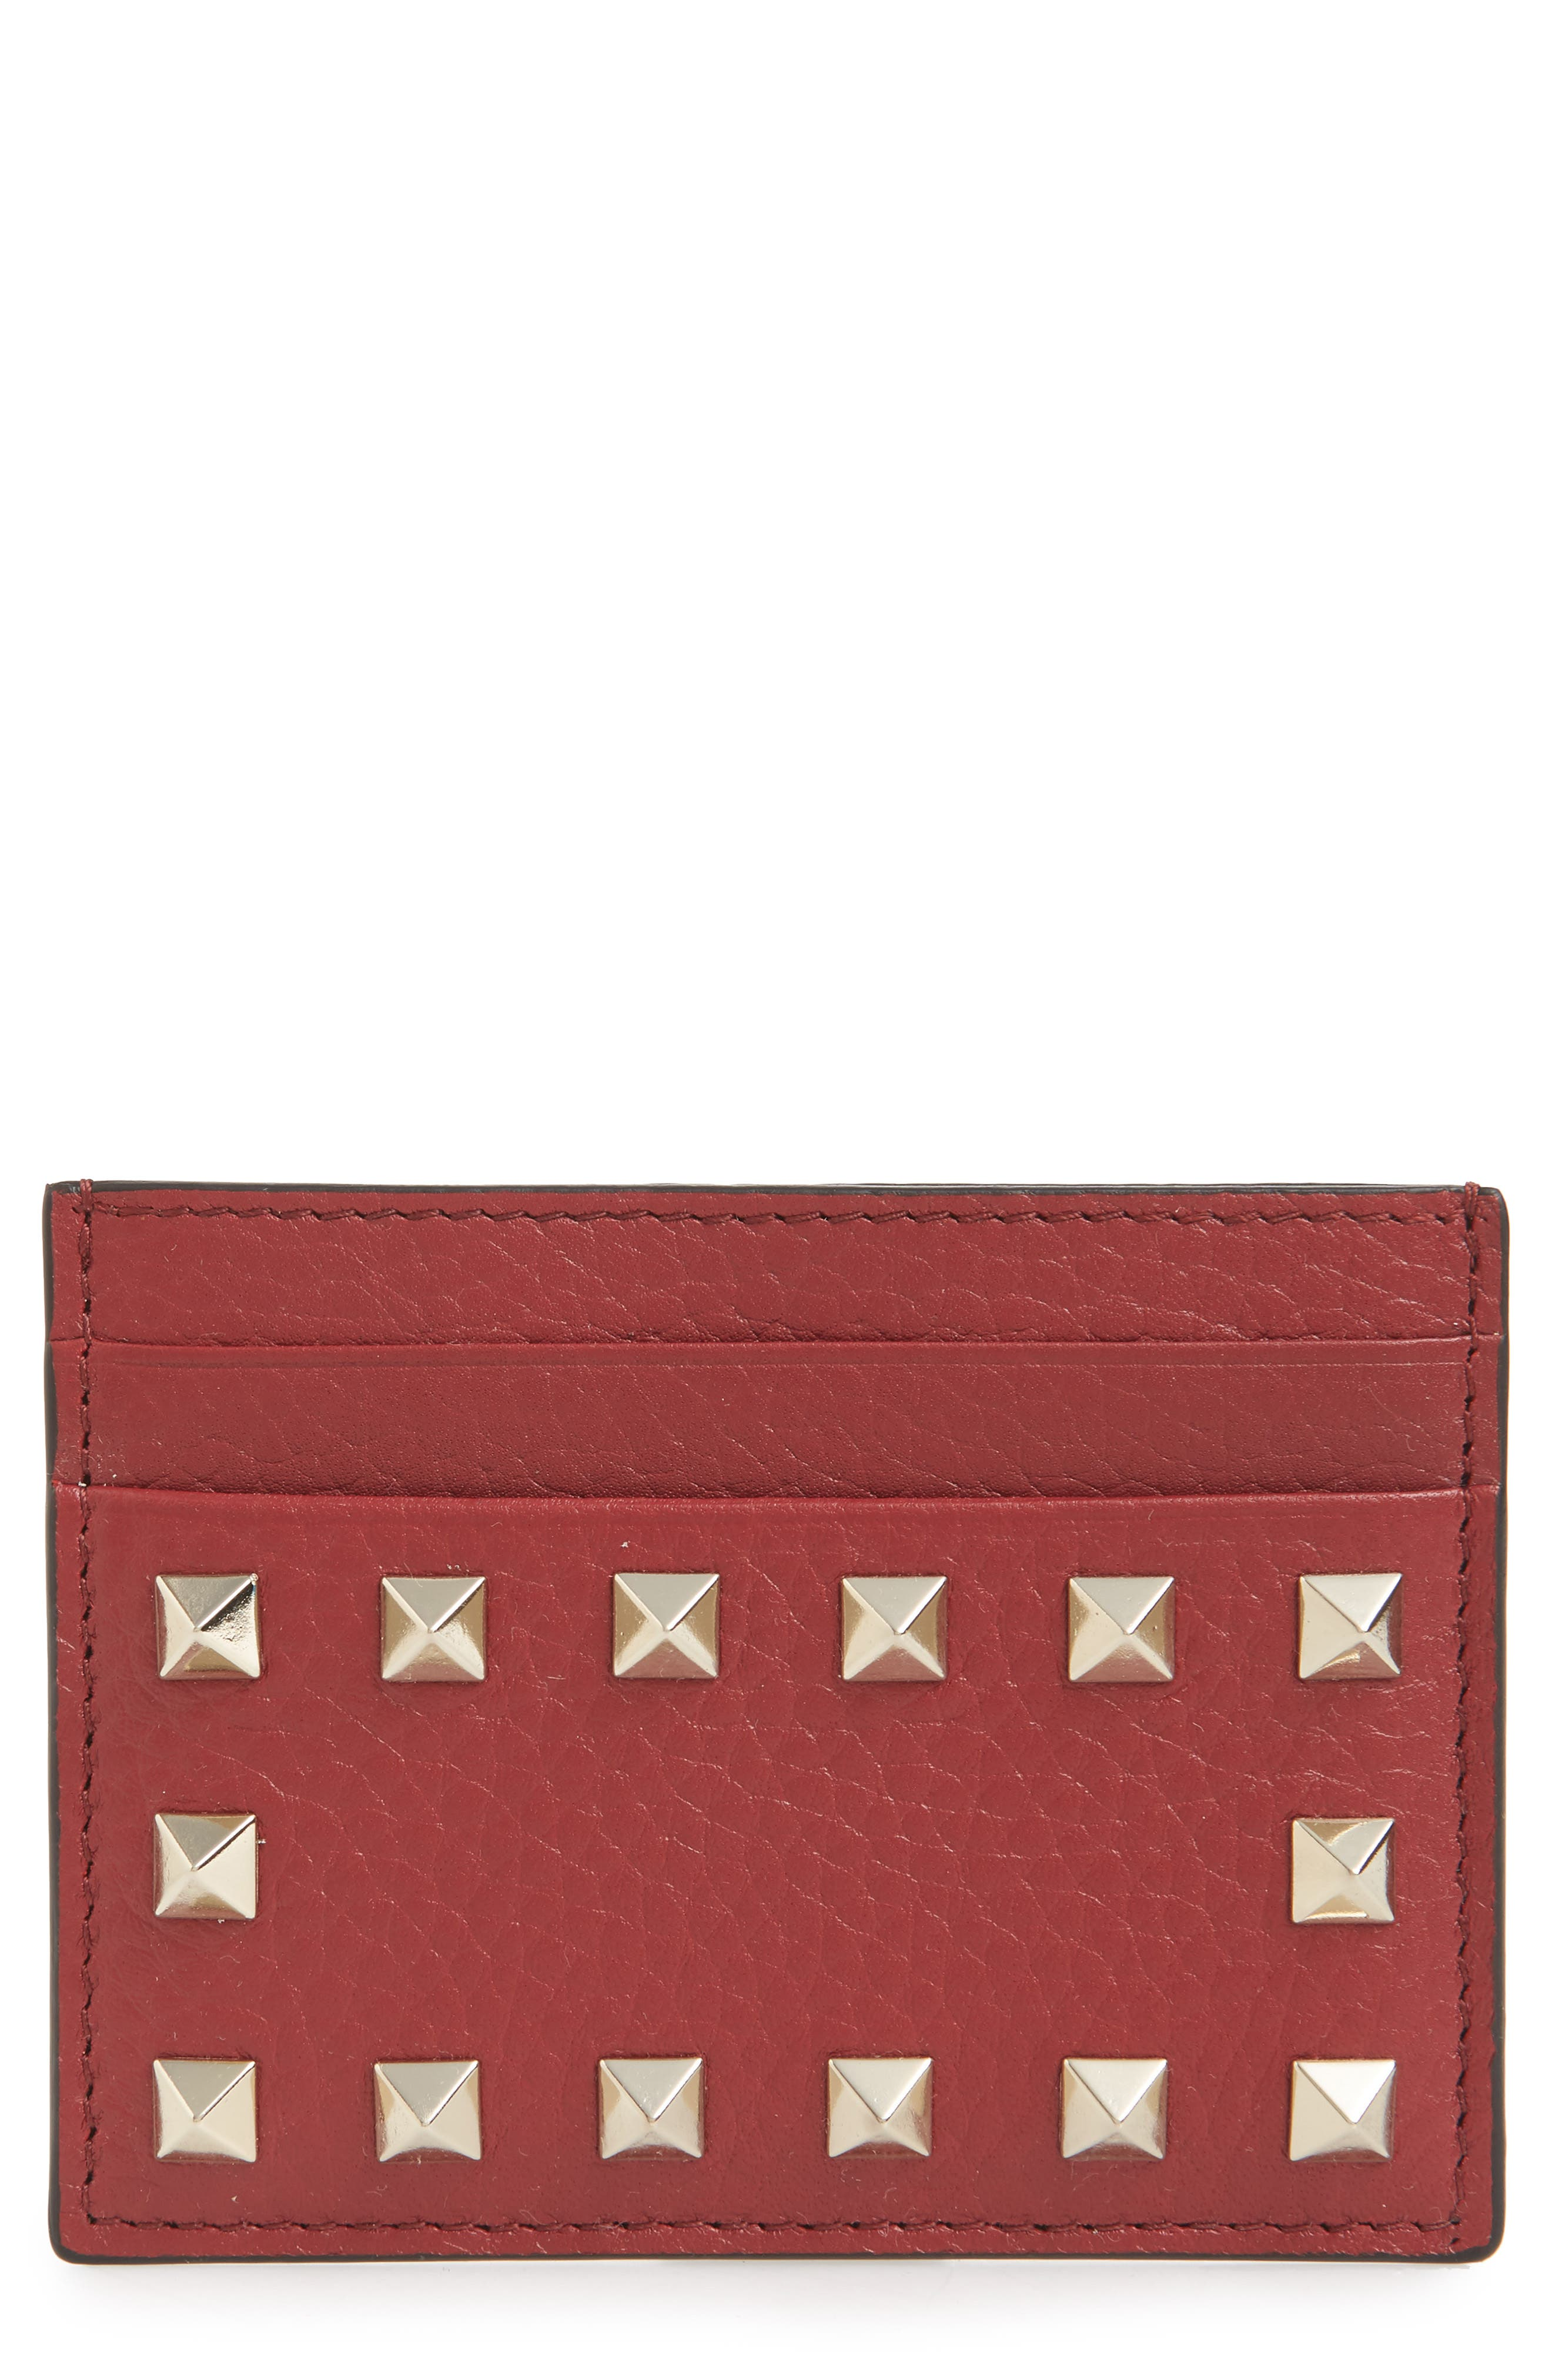 Rockstud Calfskin Leather Card Holder,                         Main,                         color, RUBINO